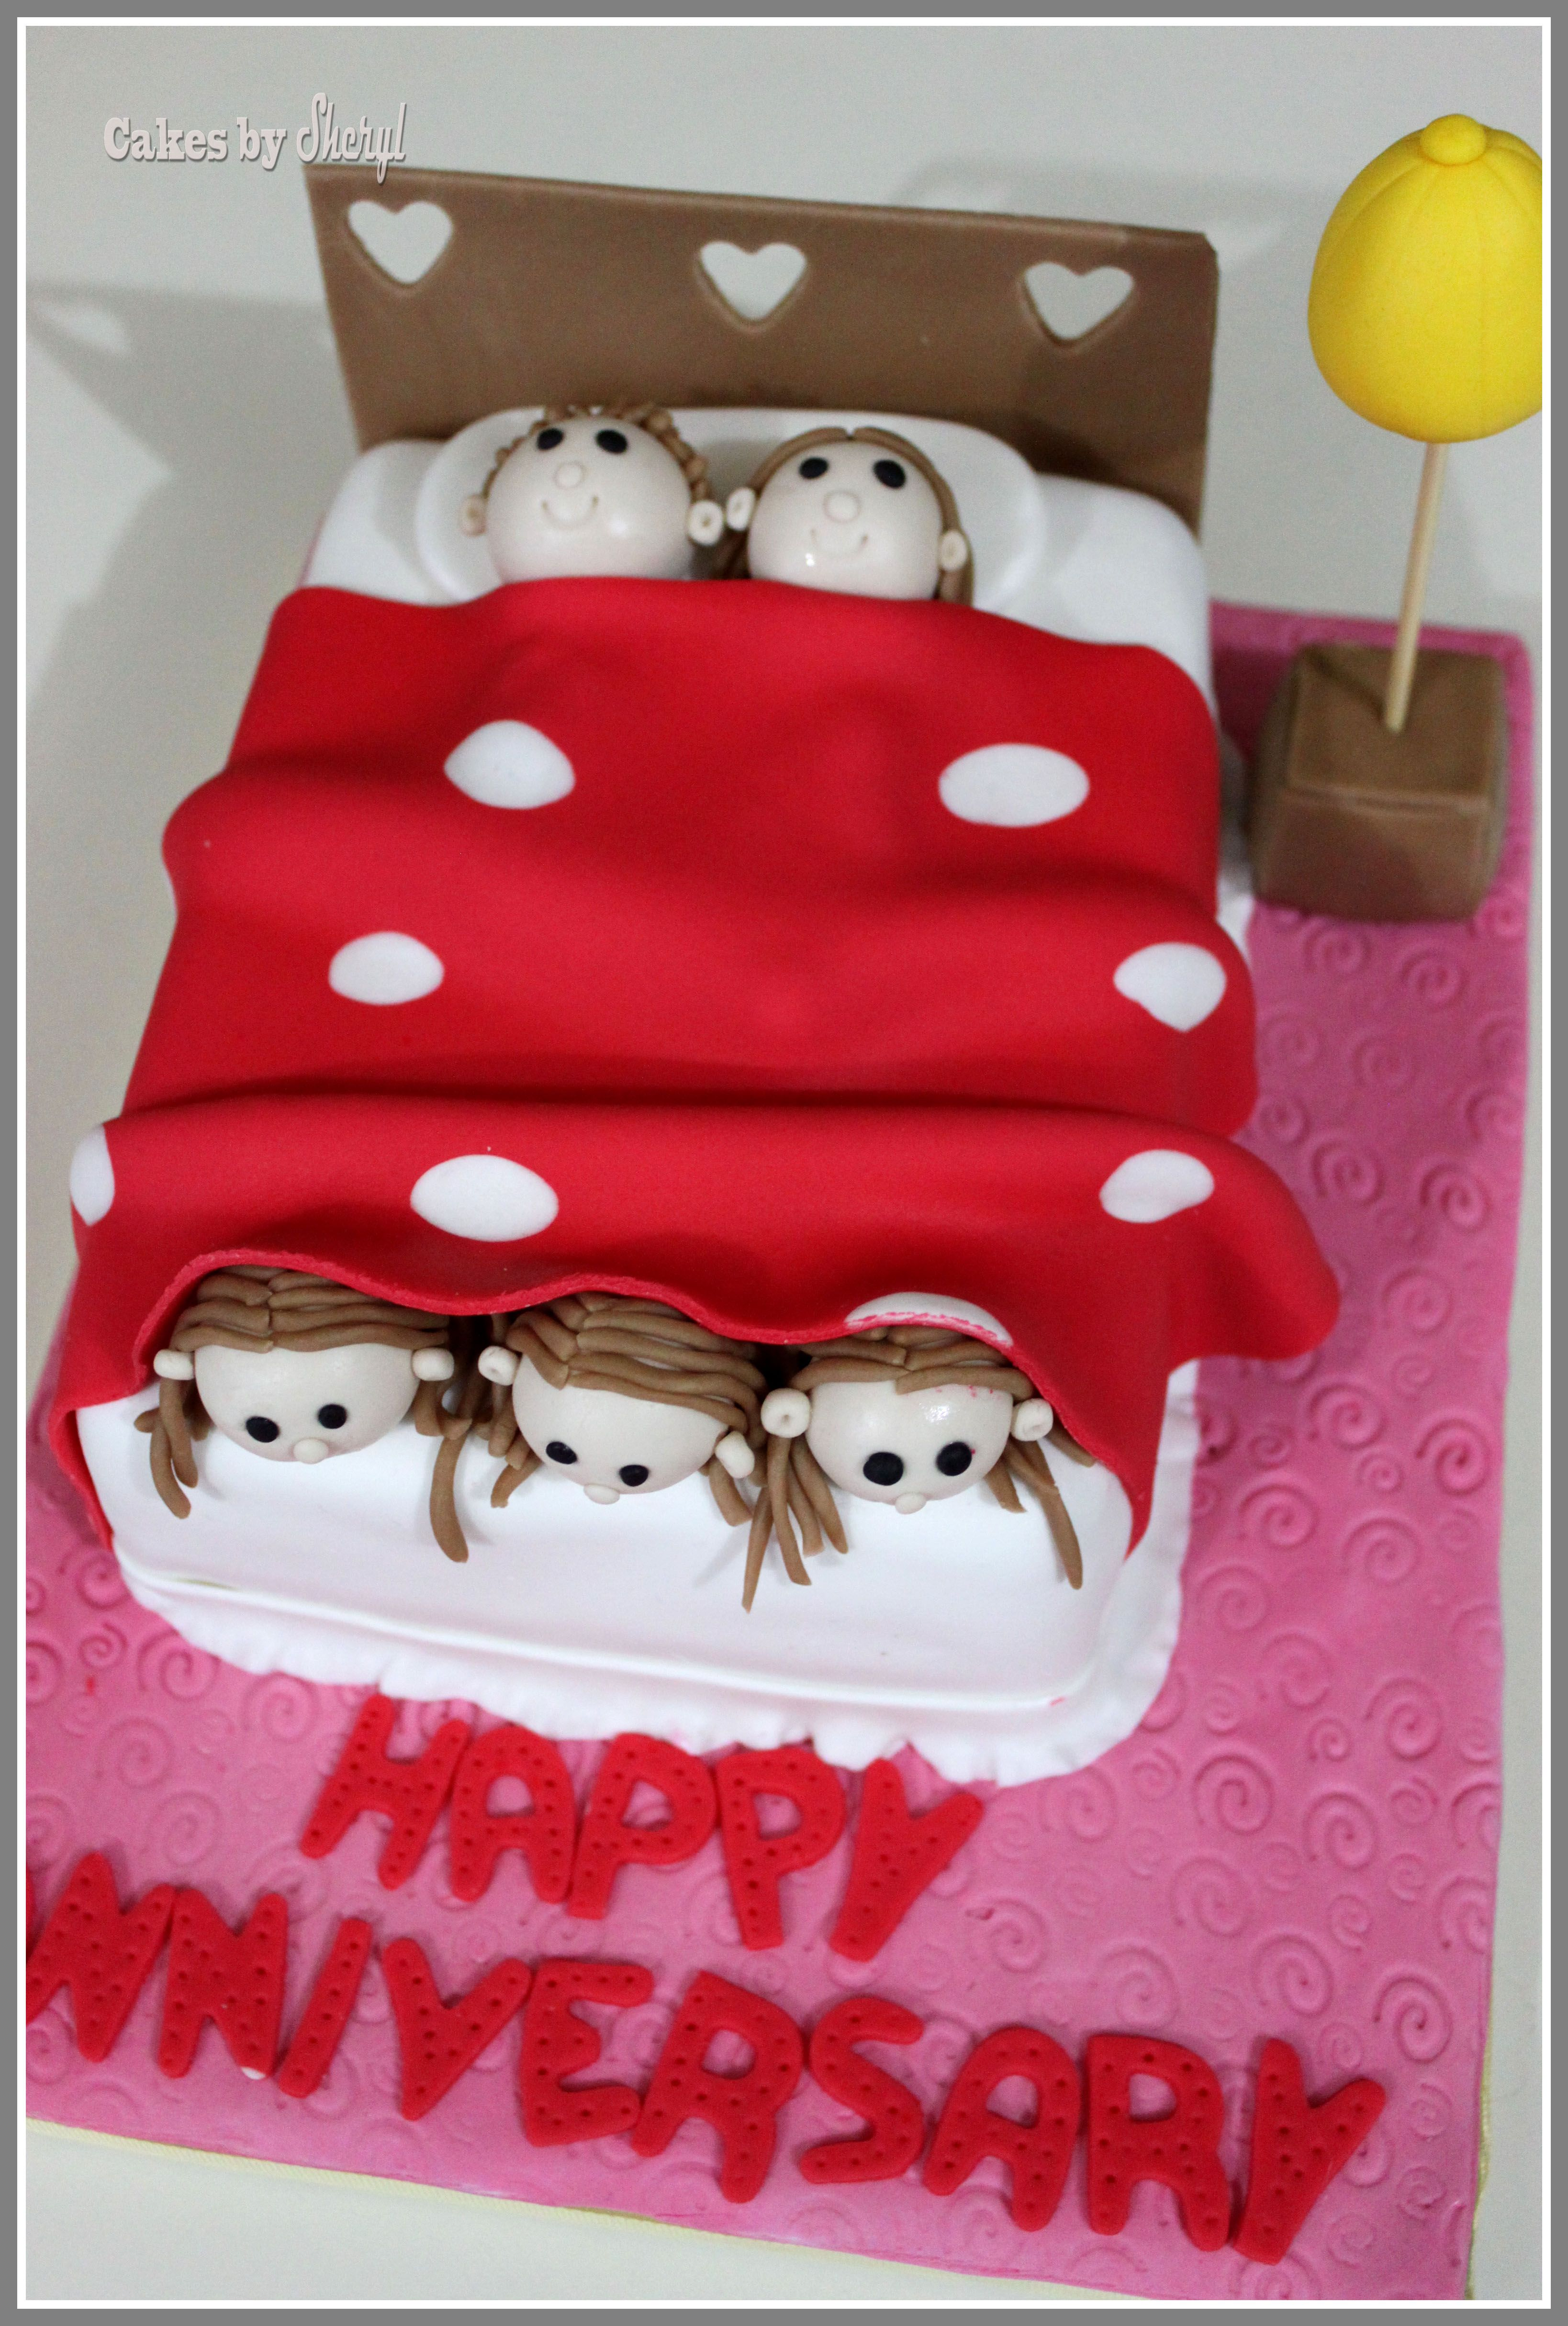 For Jacob And Me Lol Funny Wedding Anniversary Cake